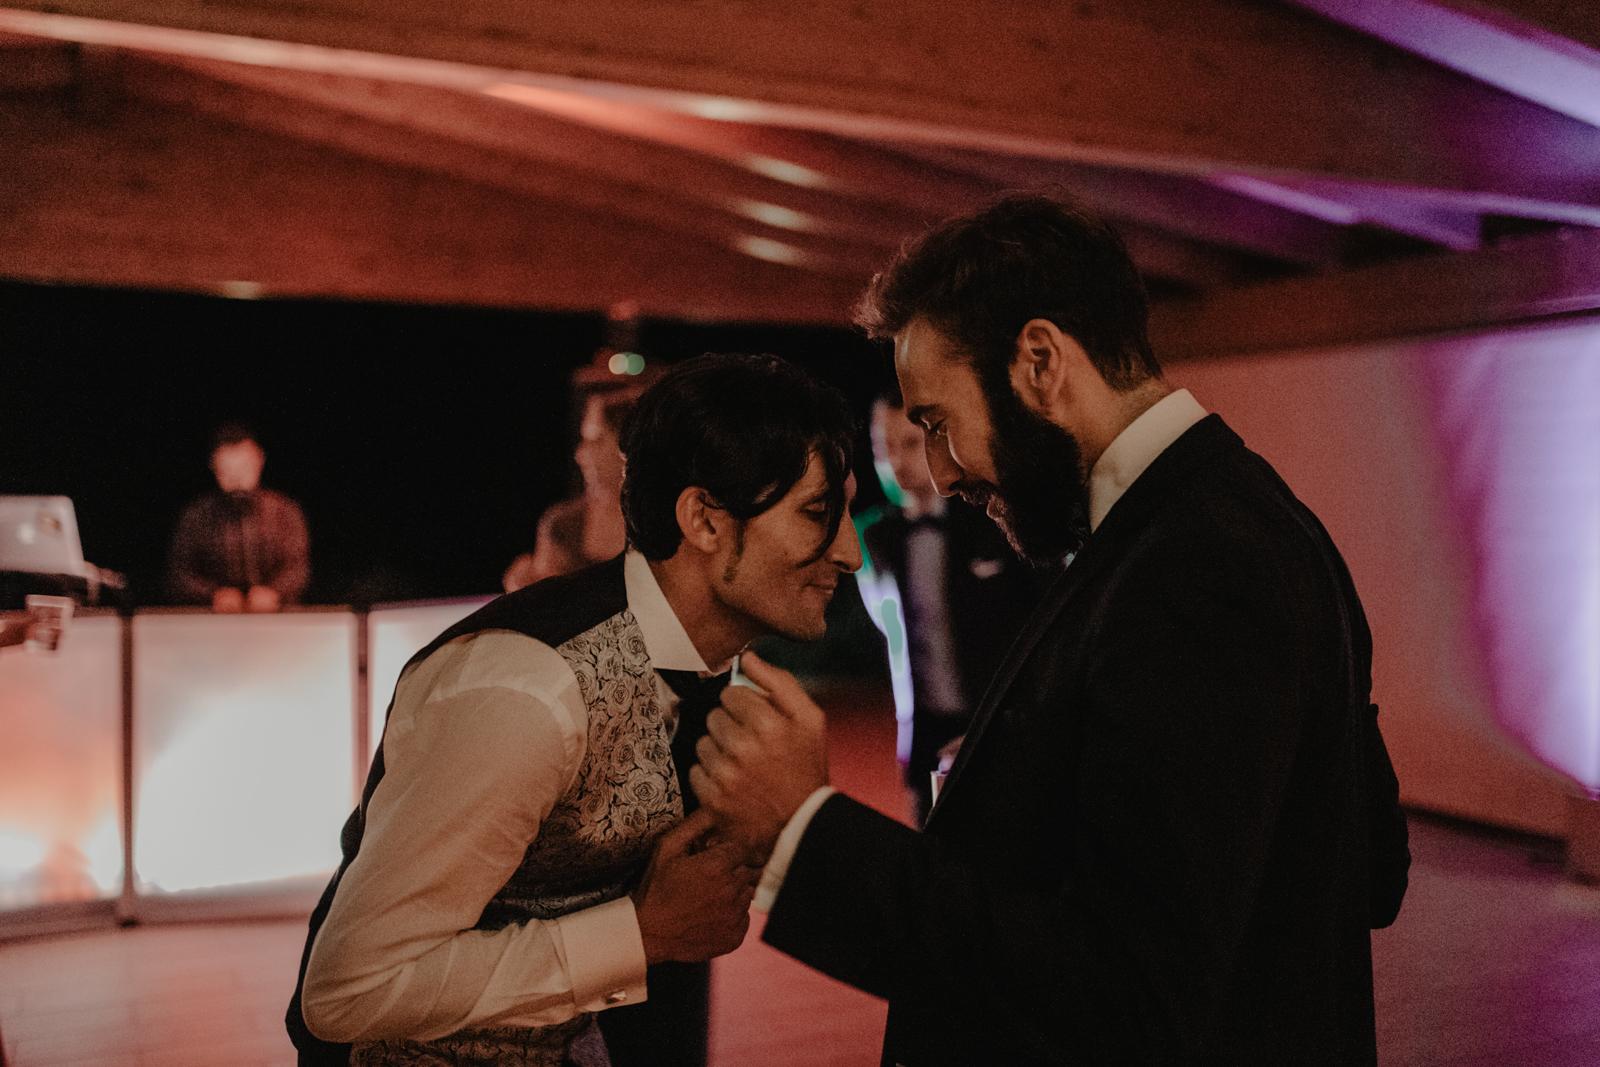 thenortherngirlphotography_photography_thenortherngirl_rebeccascabros_wedding_weddingphotography_weddingphotographer_barcelona_bodaenbarcelona_bodaenmaselmarti_bodarogeryvane-1045.jpg